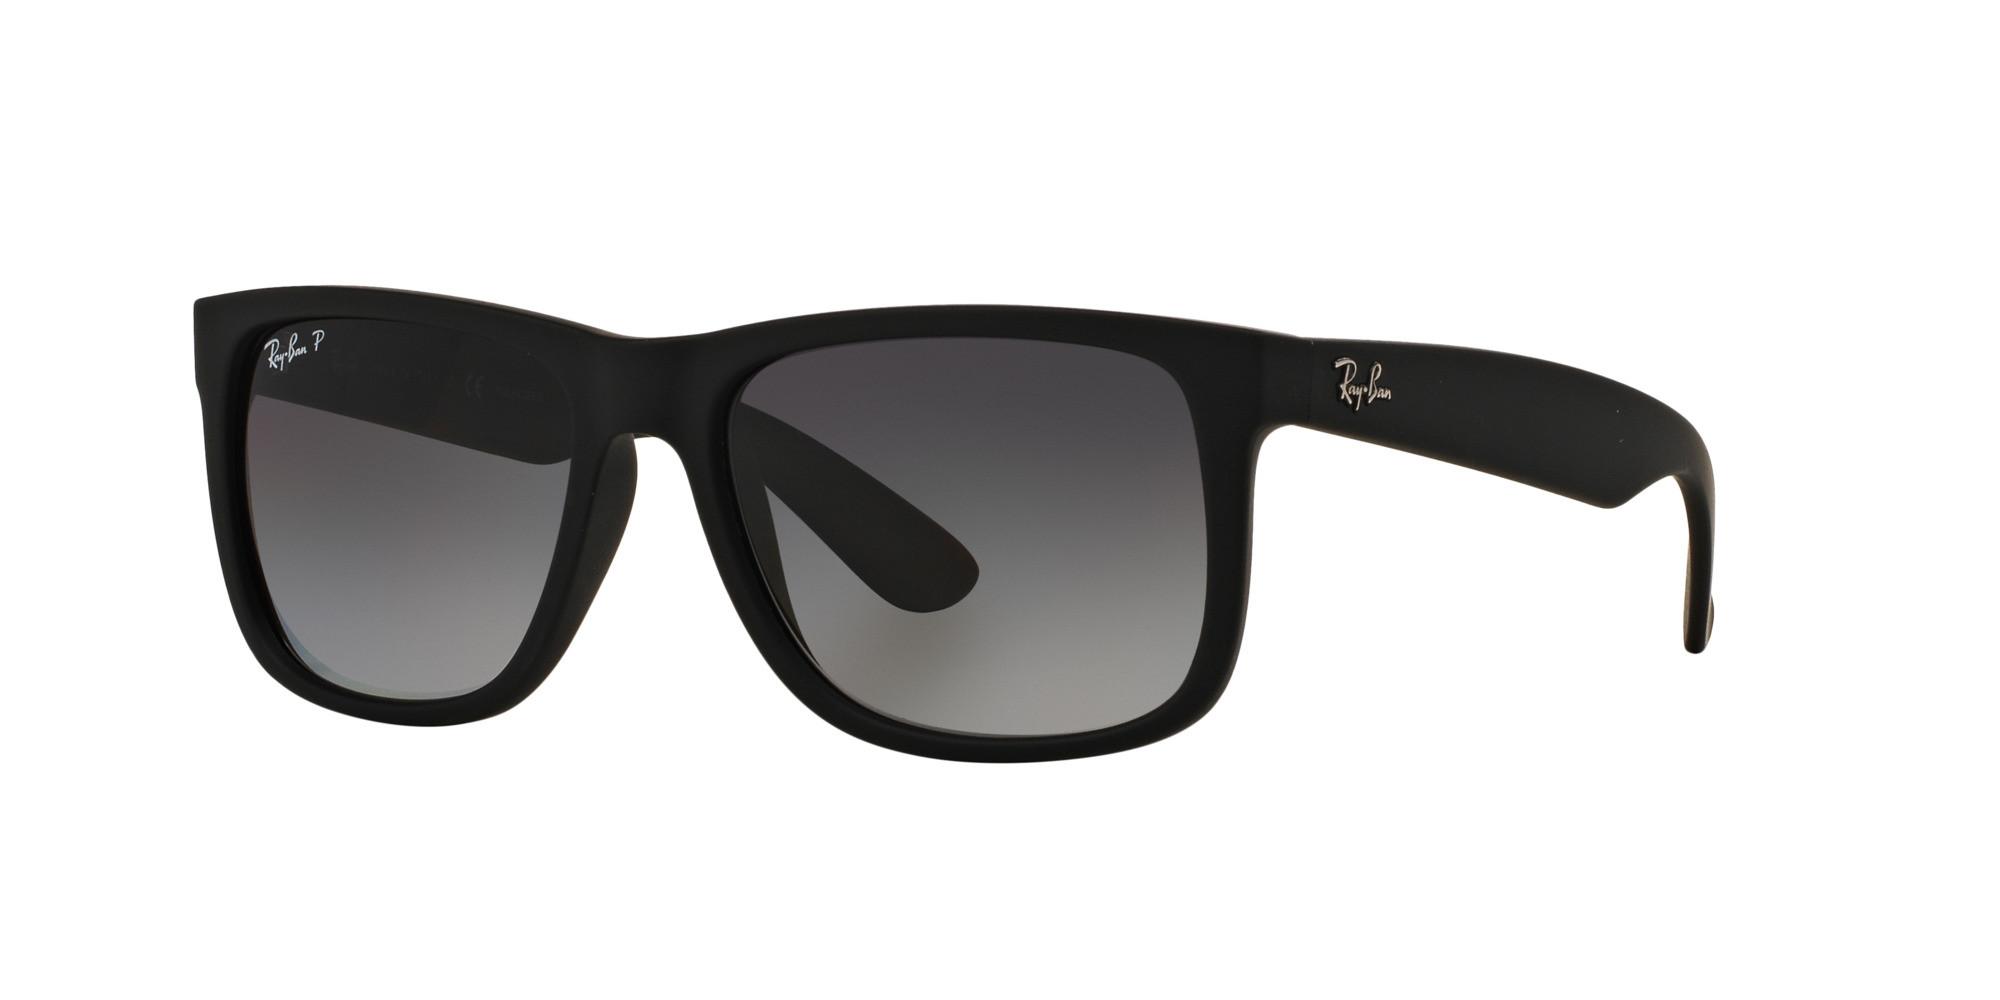 Gafas de sol RAY-BAN JUSTIN RB 4165 622/T3 POLARIZADAS